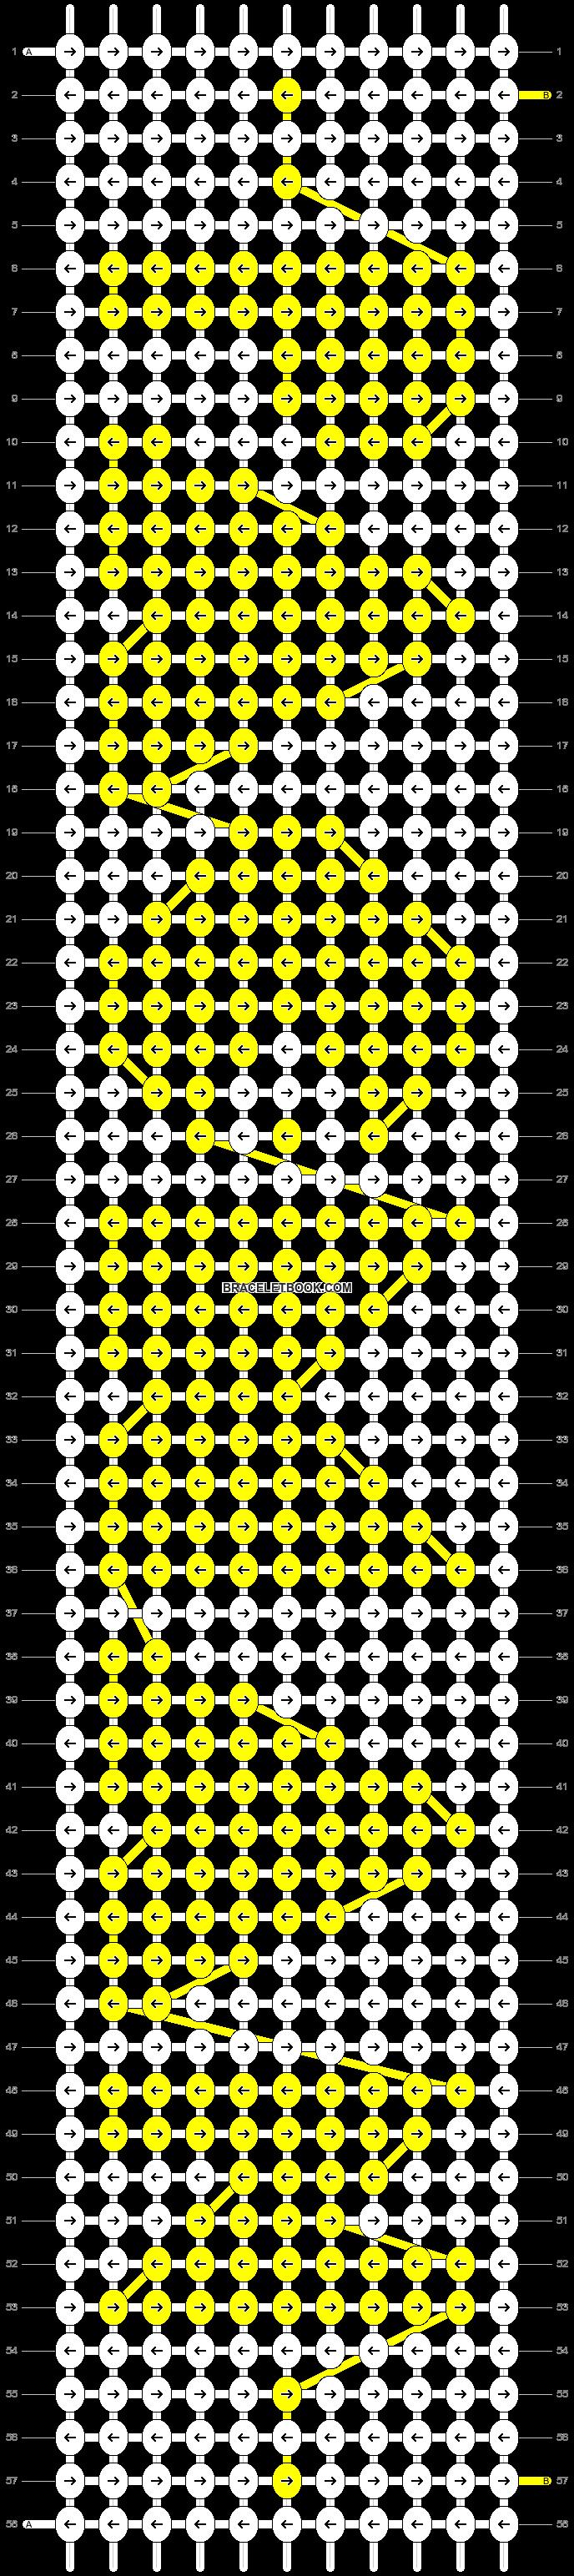 Alpha pattern #11027 pattern